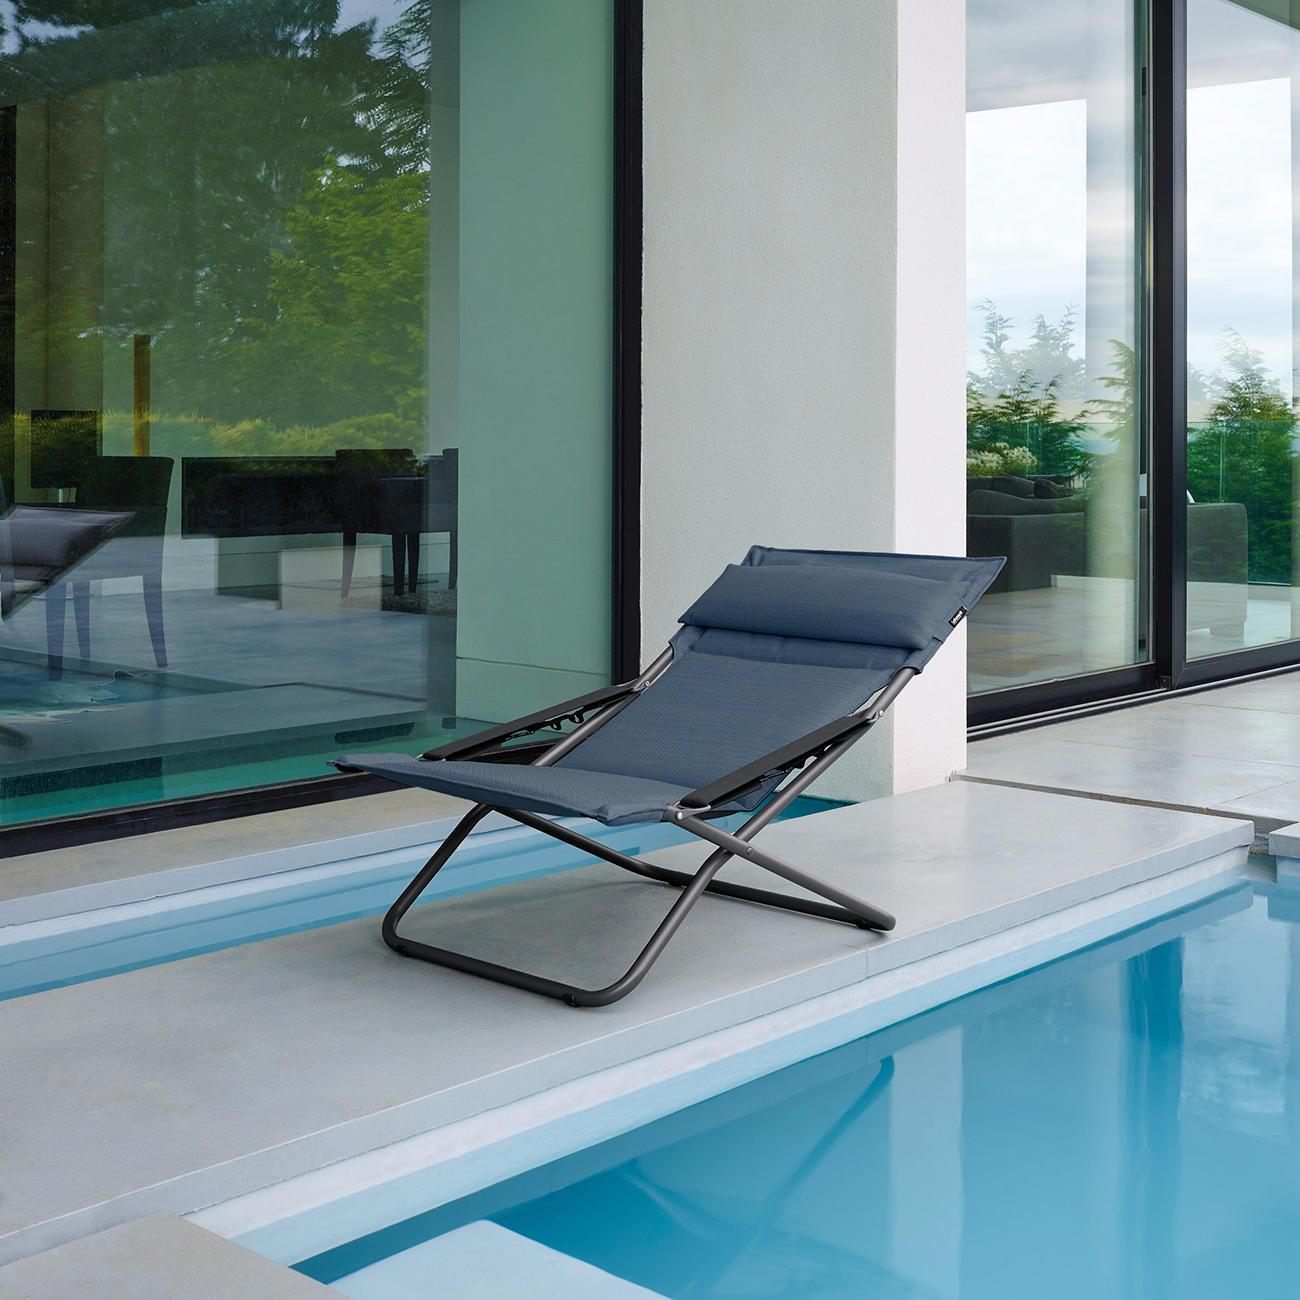 09214420180211 liegestuhl garten bauhaus inspiration. Black Bedroom Furniture Sets. Home Design Ideas